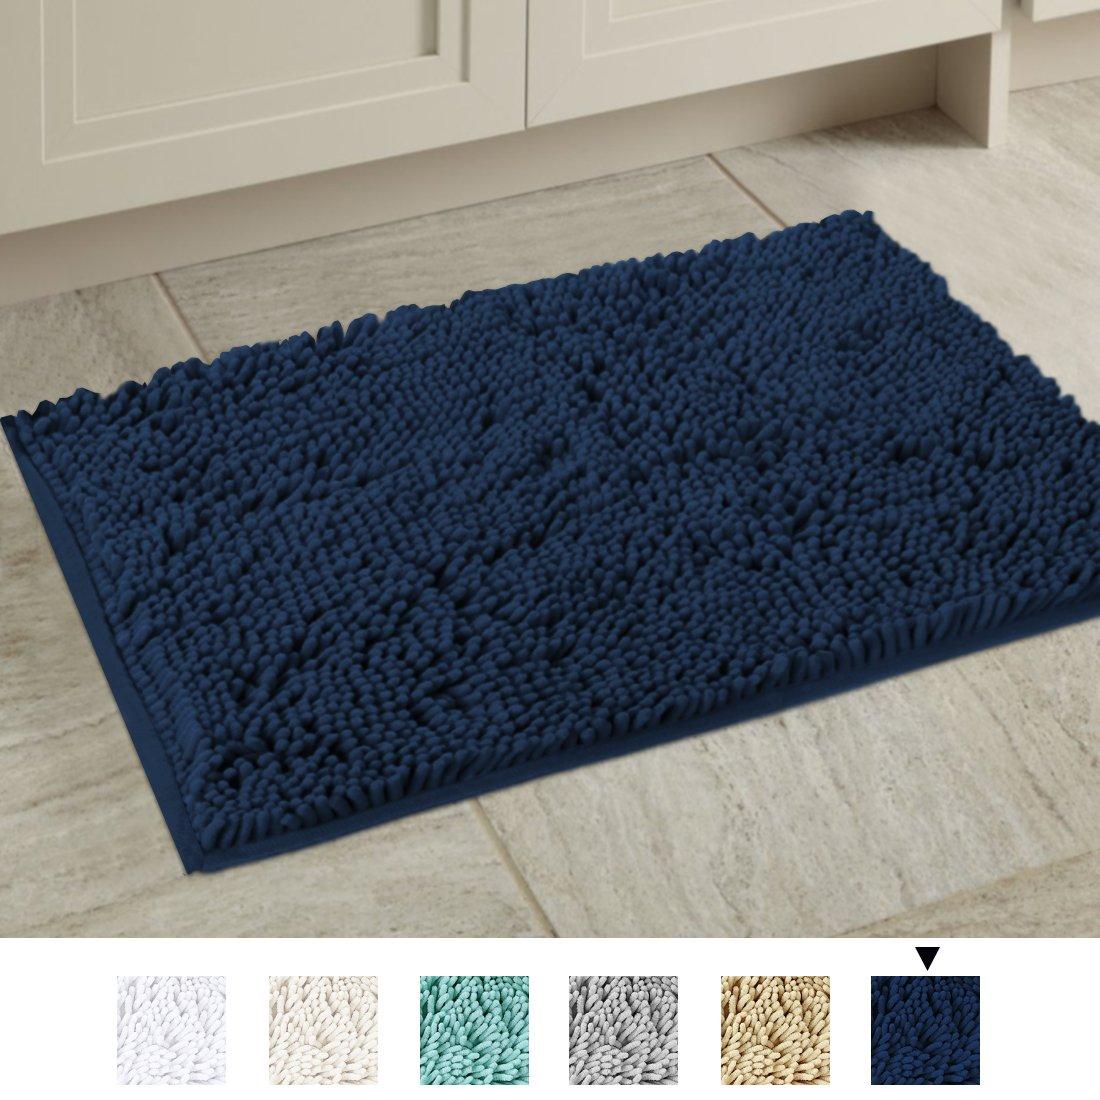 H.VERSAILTEX 20x32 inch Oversize Bathroom Rug Shag Shower Mat Soft Texture Floor Mat Machine-washable Bath mats with Water Absorbent Soft Microfibers Rugs for Kitchen, Navy